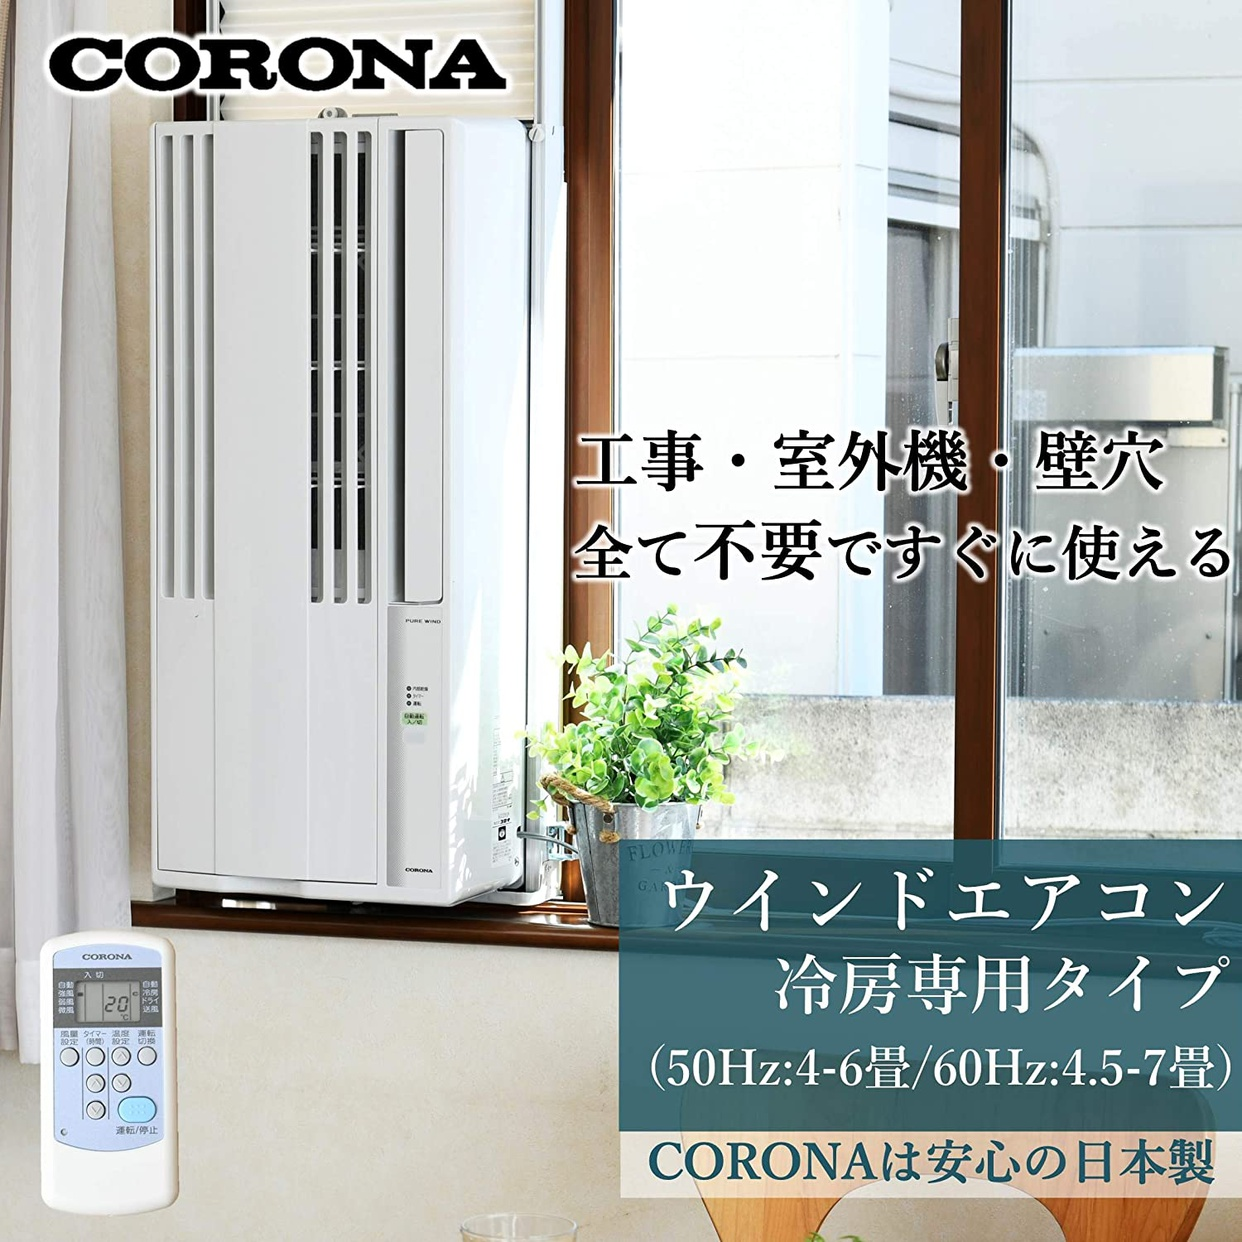 CORONA(コロナ) ウインドエアコン CW-16A(WS)の商品画像2